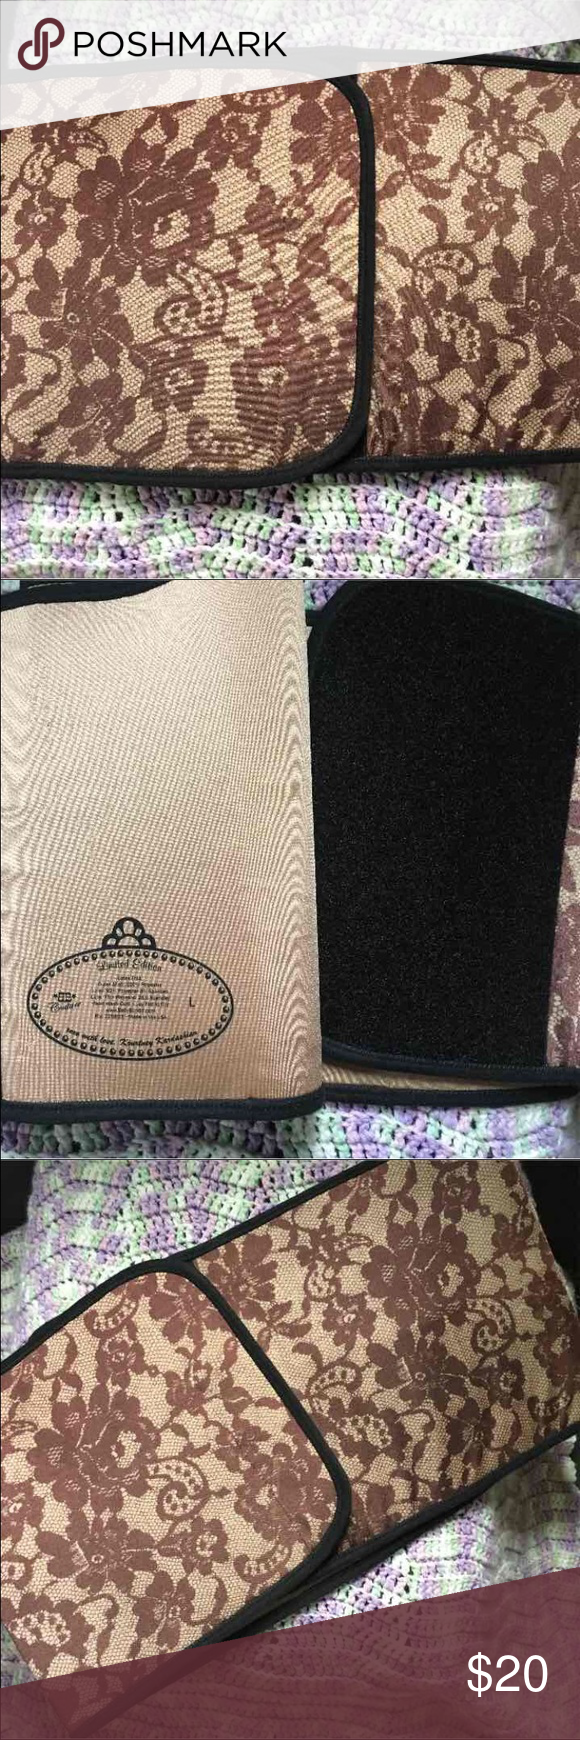 Limited edition kourtney kardashian belly bandit, black lace, x.